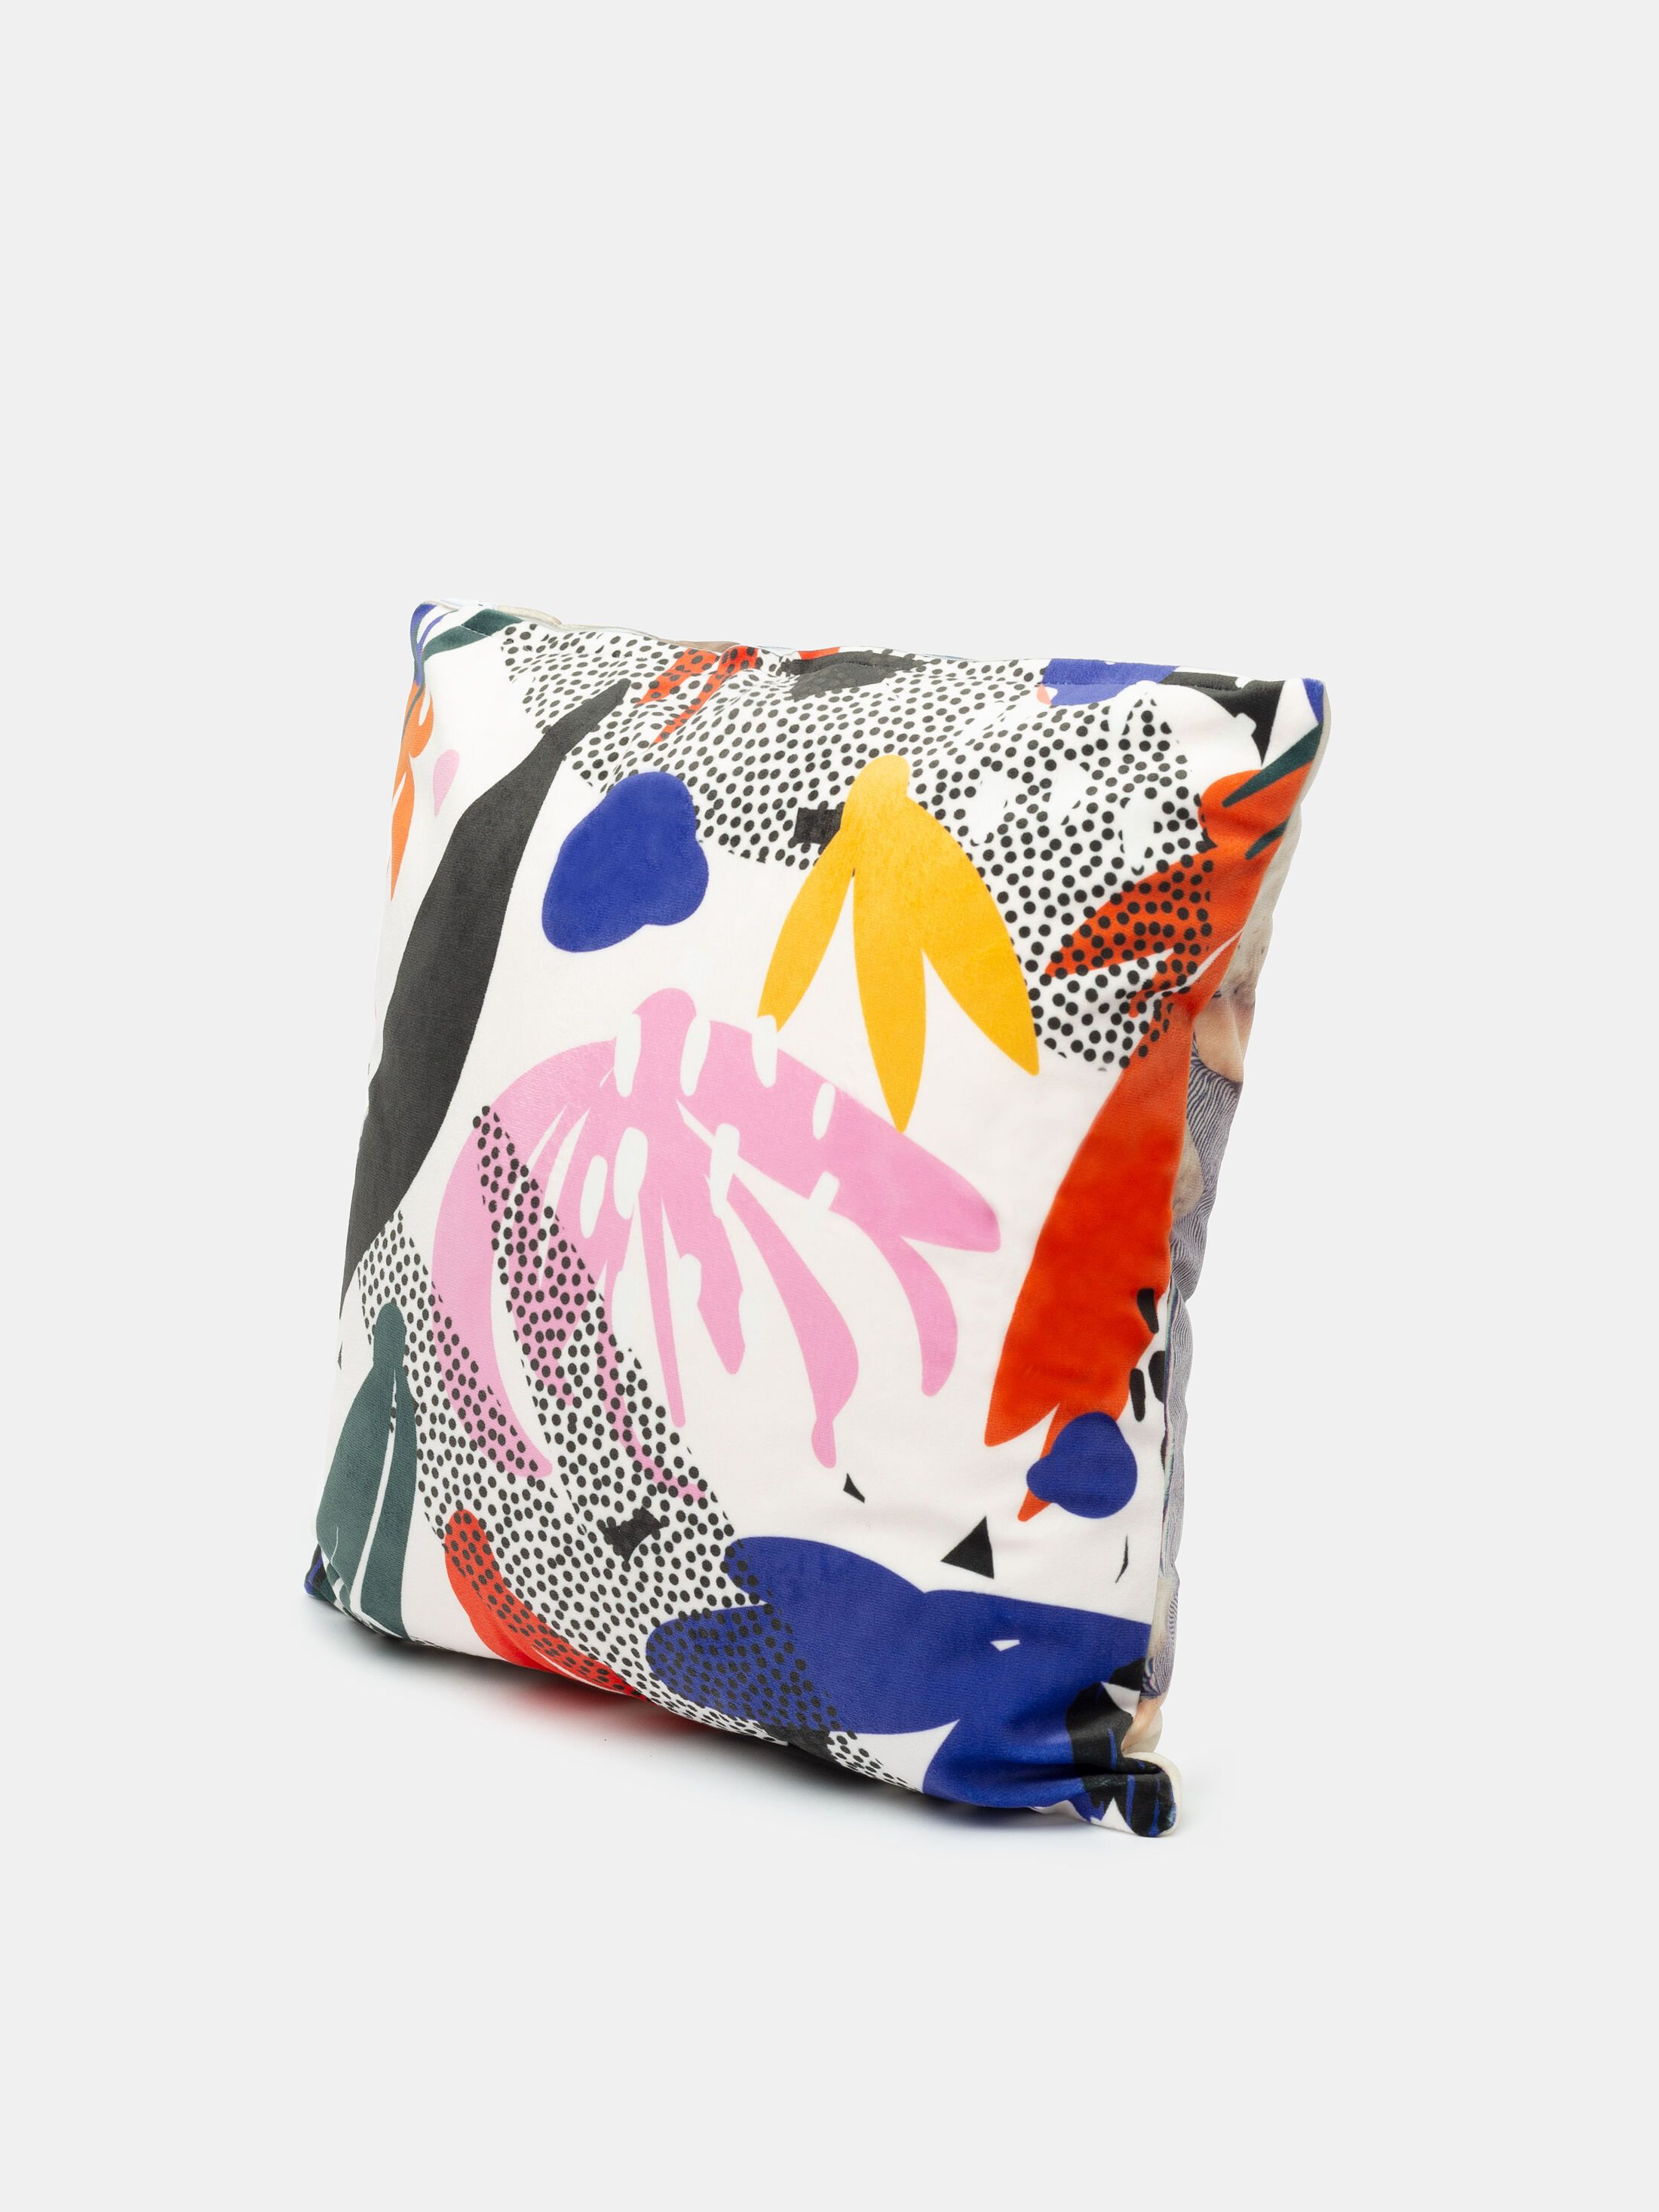 custom throw pillow with logo